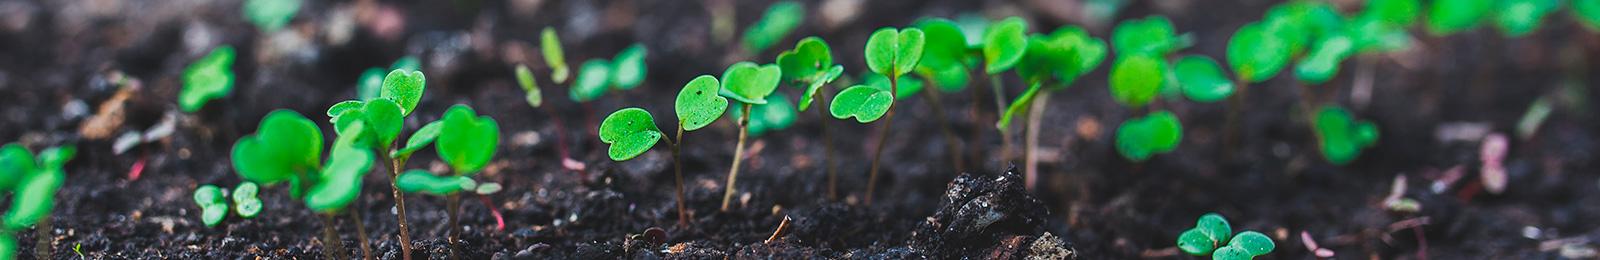 Seed Starting Basics